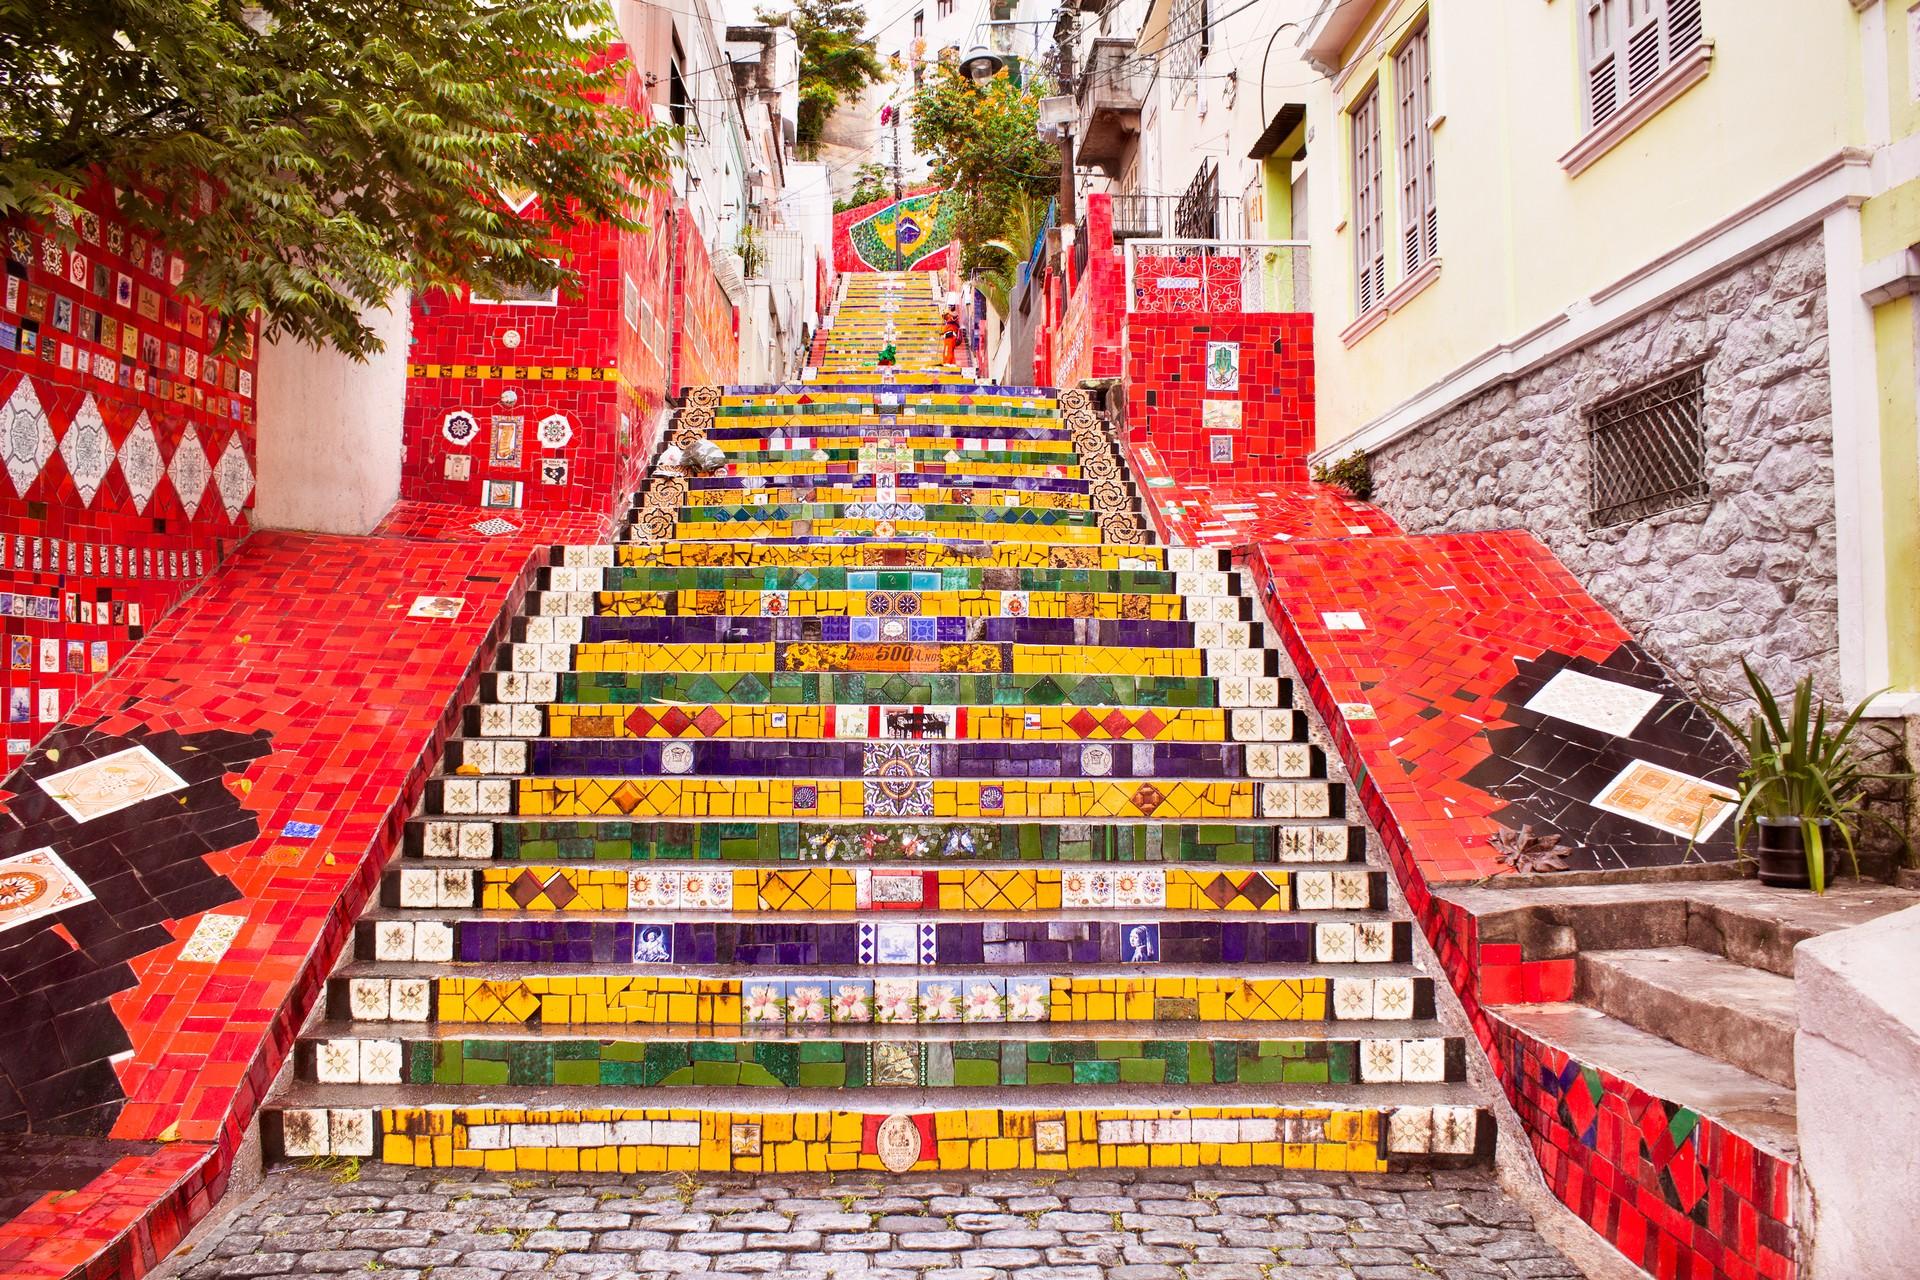 The colourful steps in Rio de Janeiro, Brazil